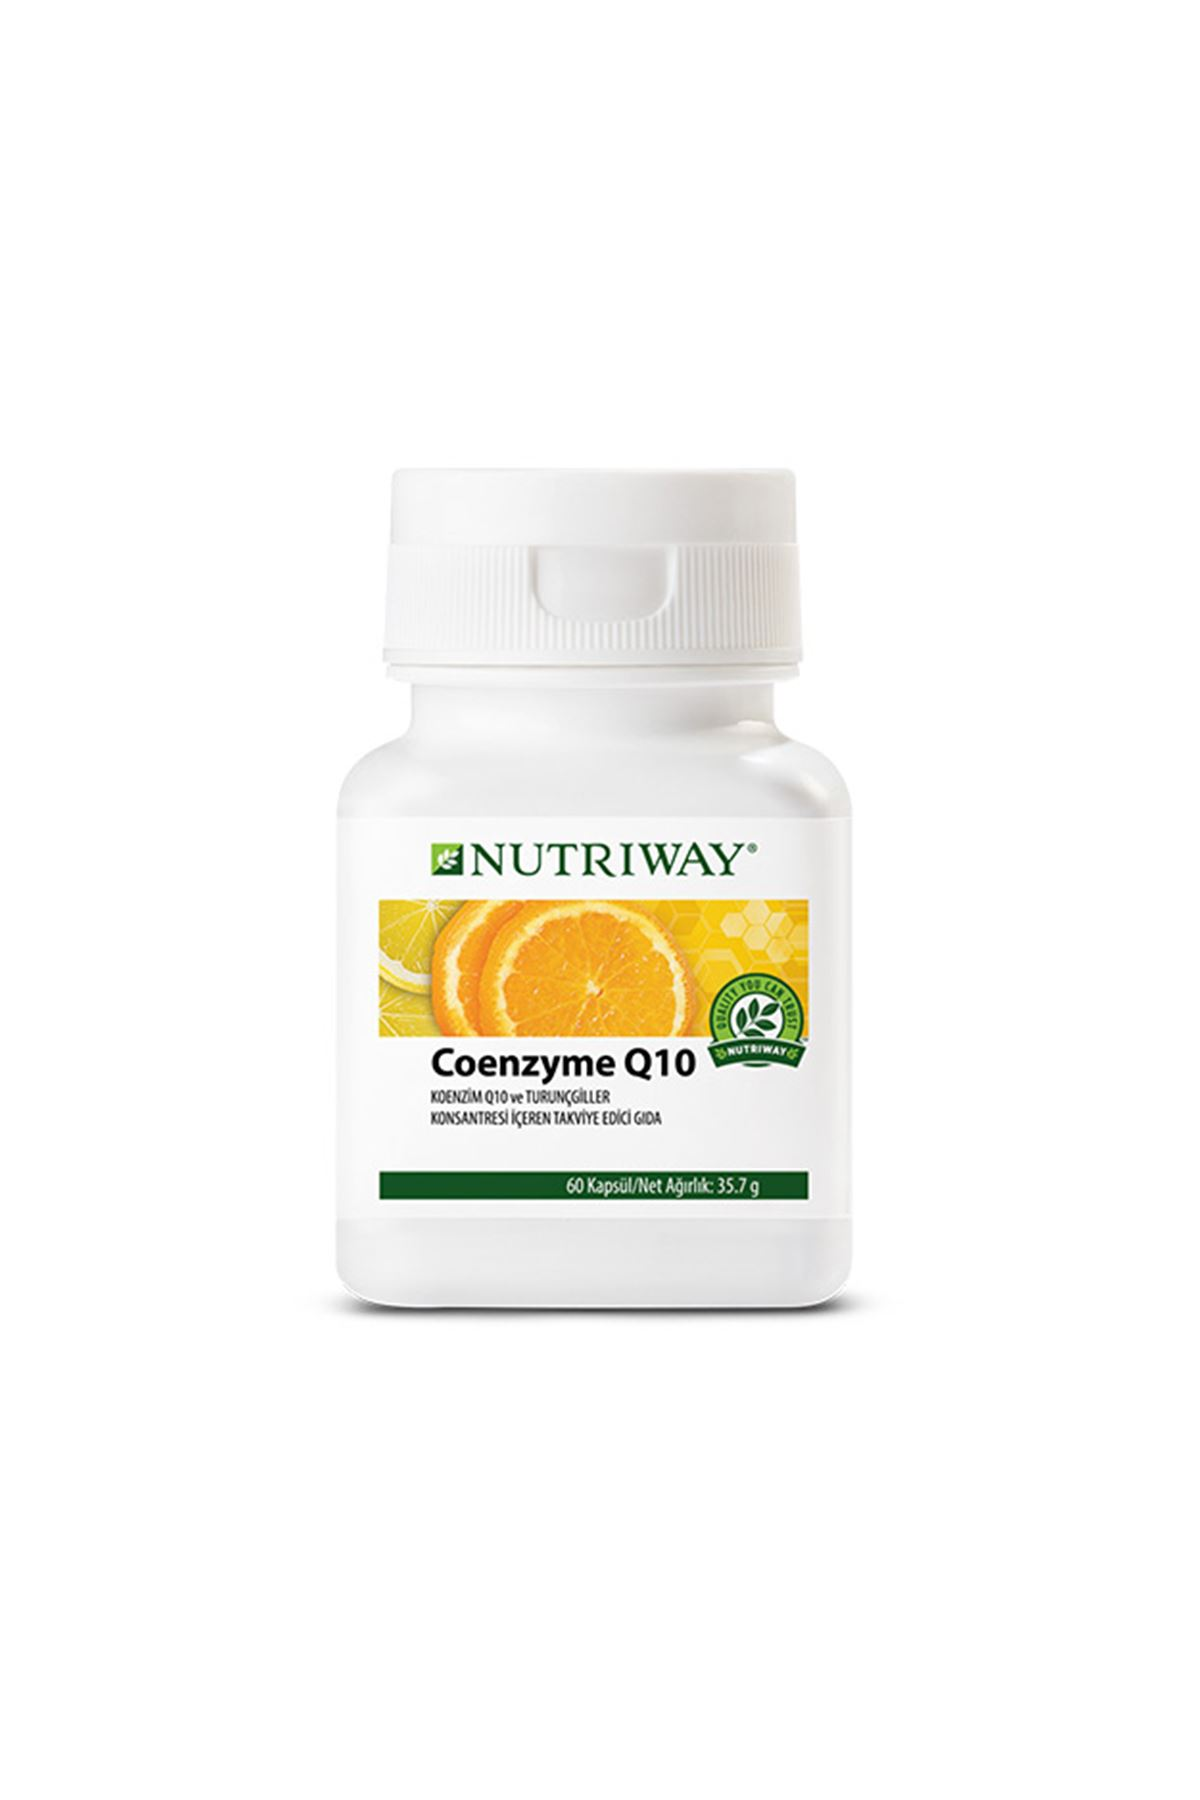 Coenzyme Q10 NUTRIWAY™